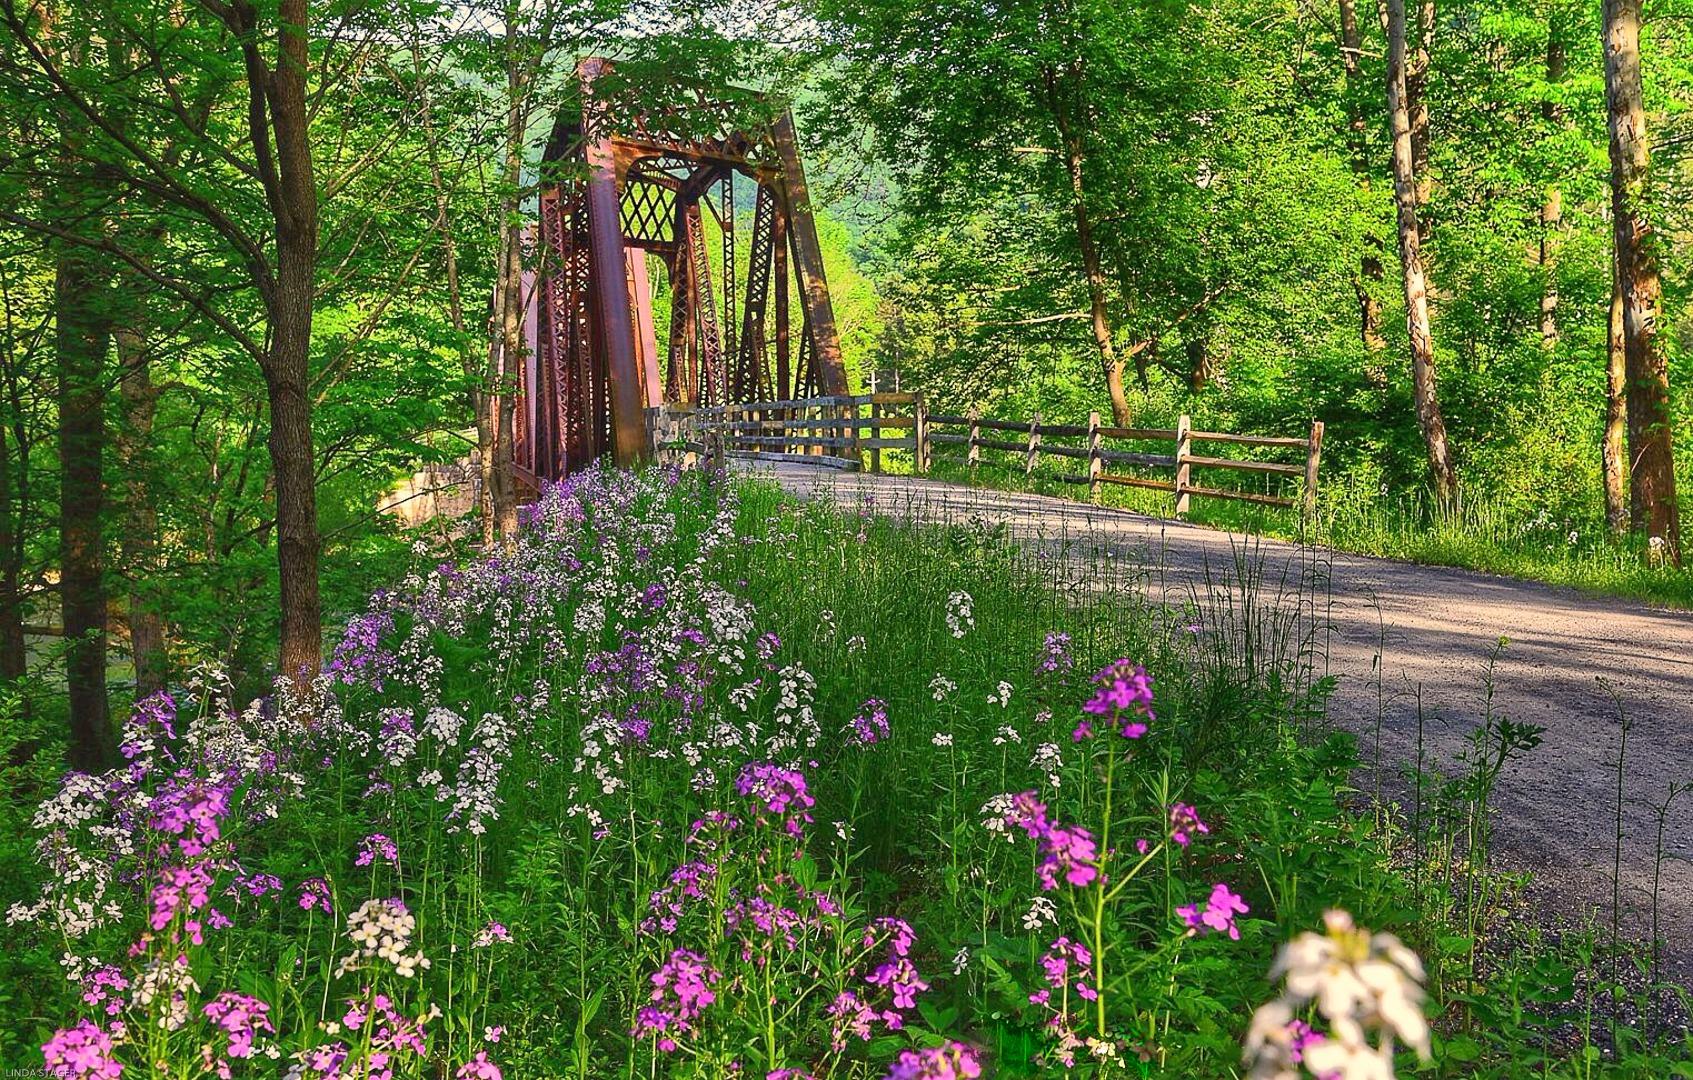 Pennsylvania S Pine Creek Rail Trail Trailblog